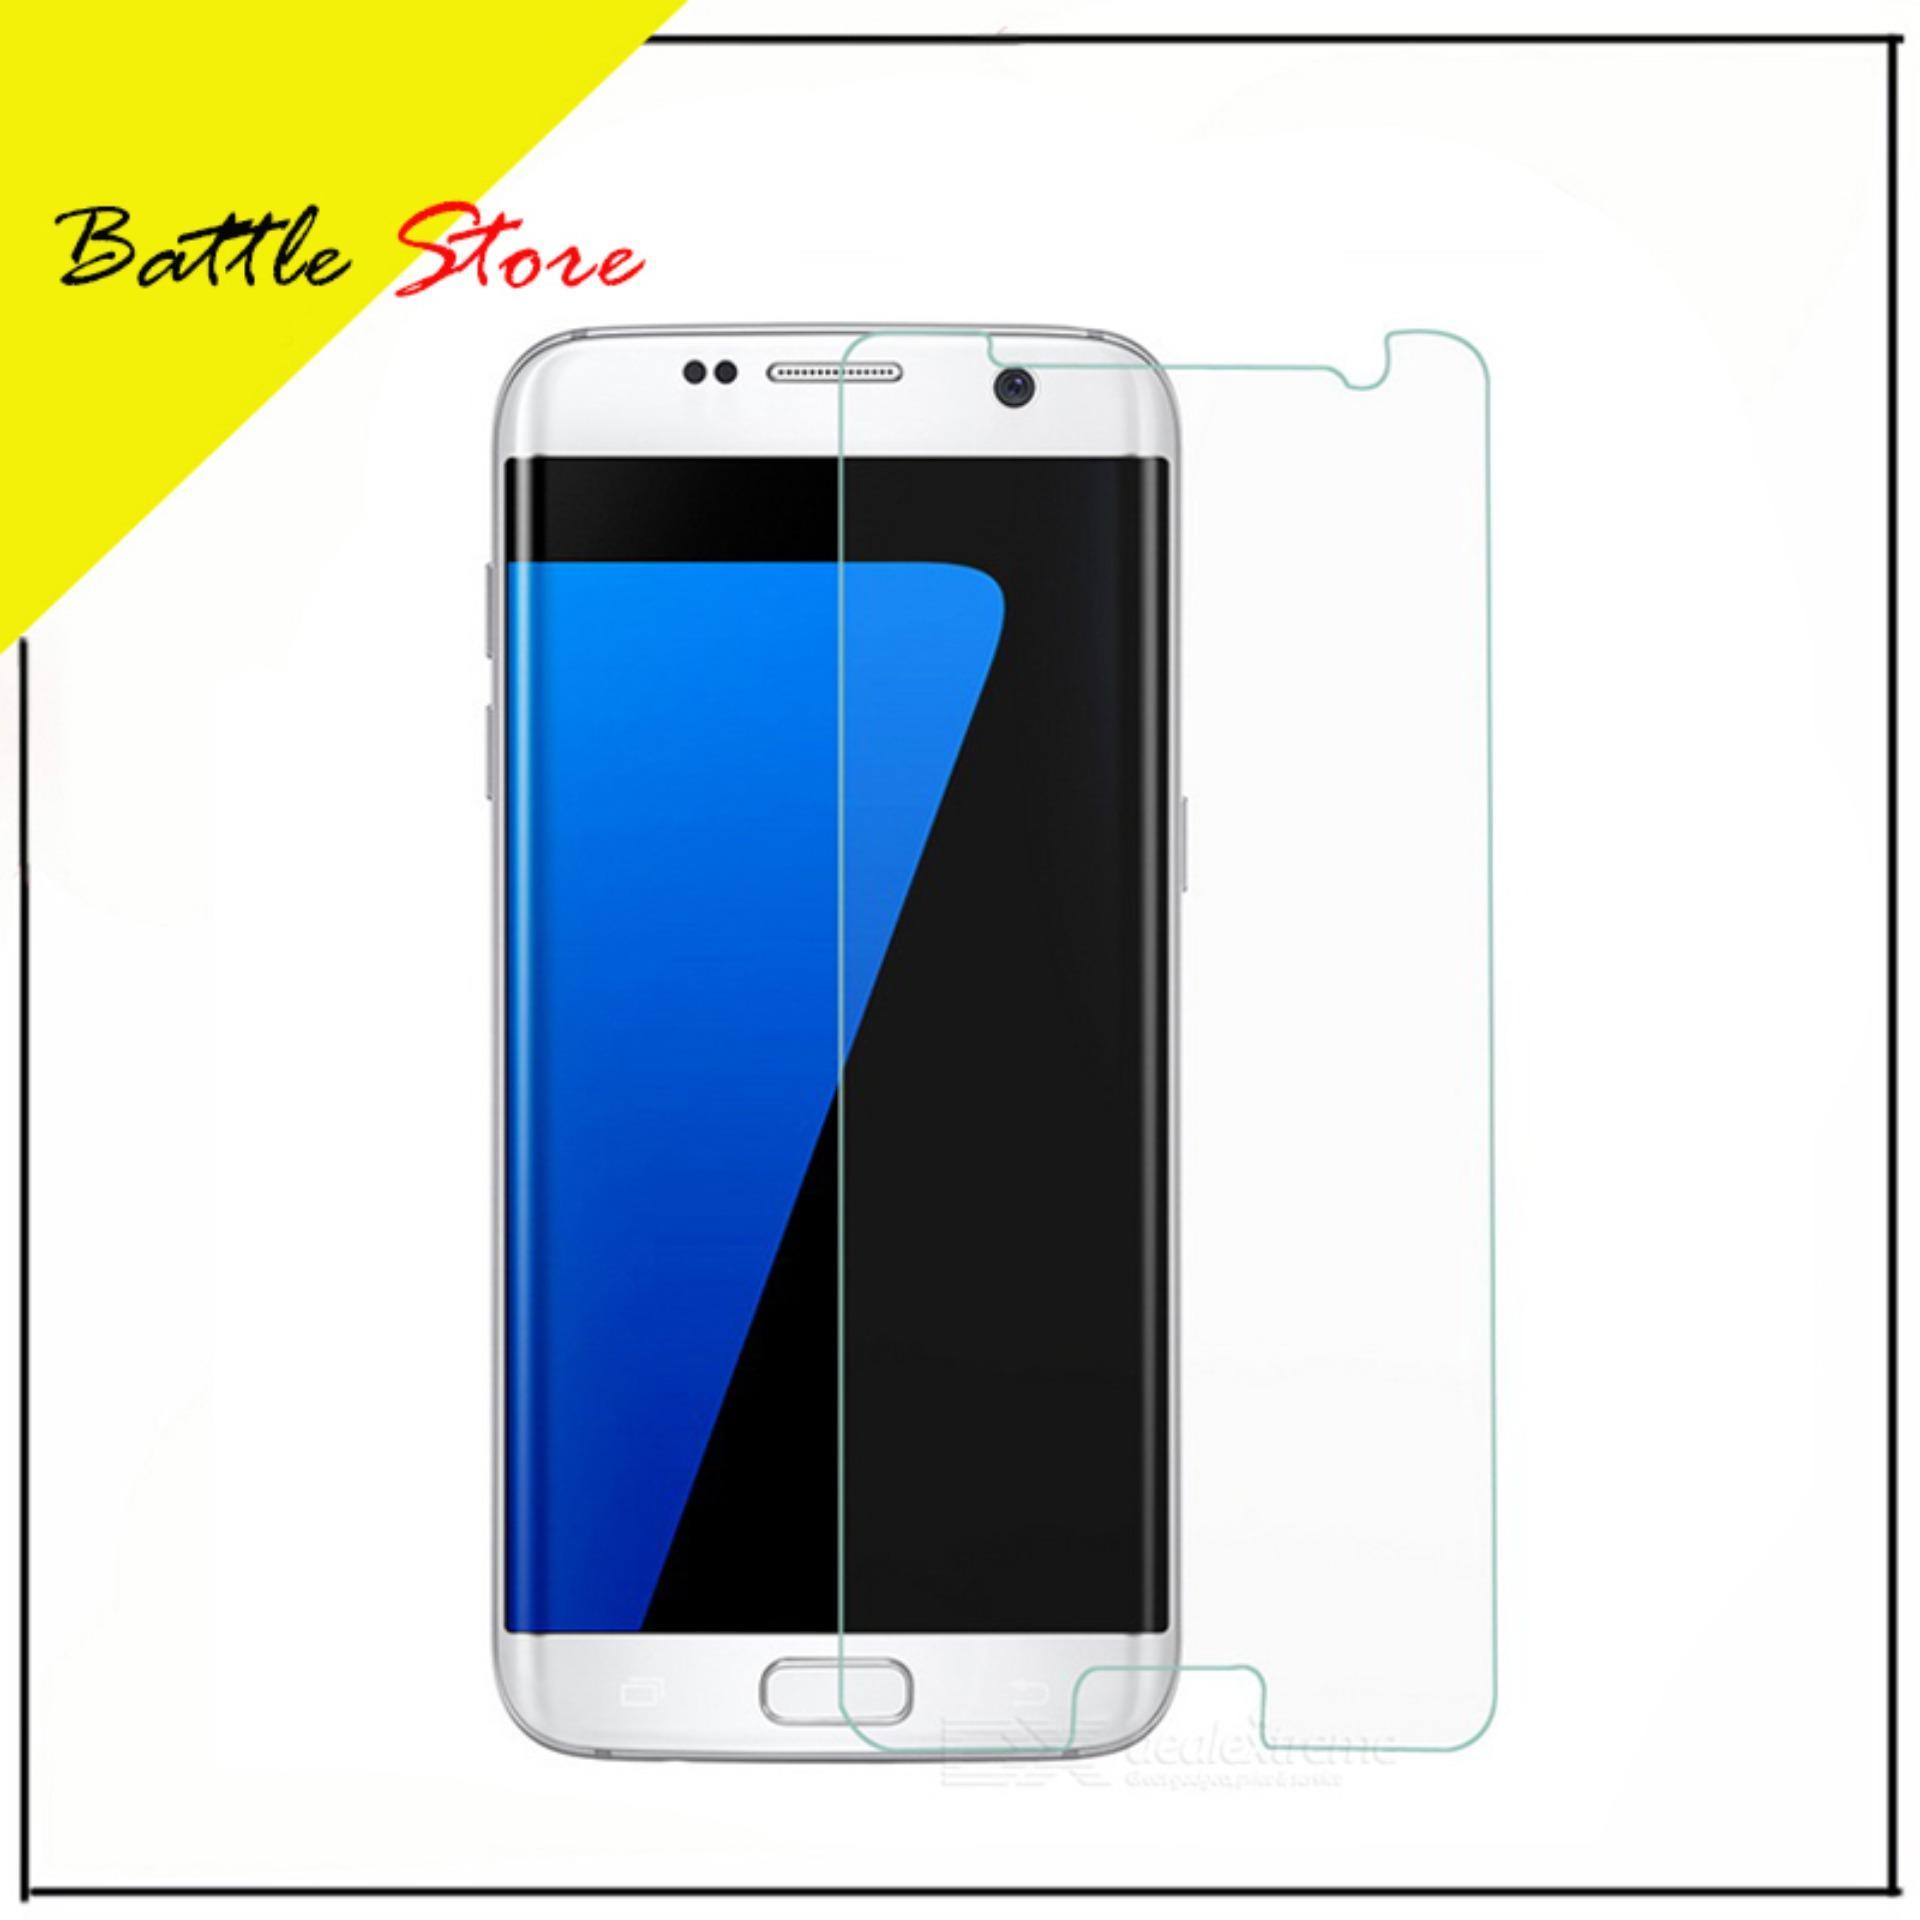 Samsung Galaxy S7 Flat Premium Smile Screen Protector Tempered Glass / Anti Gores Kaca - White